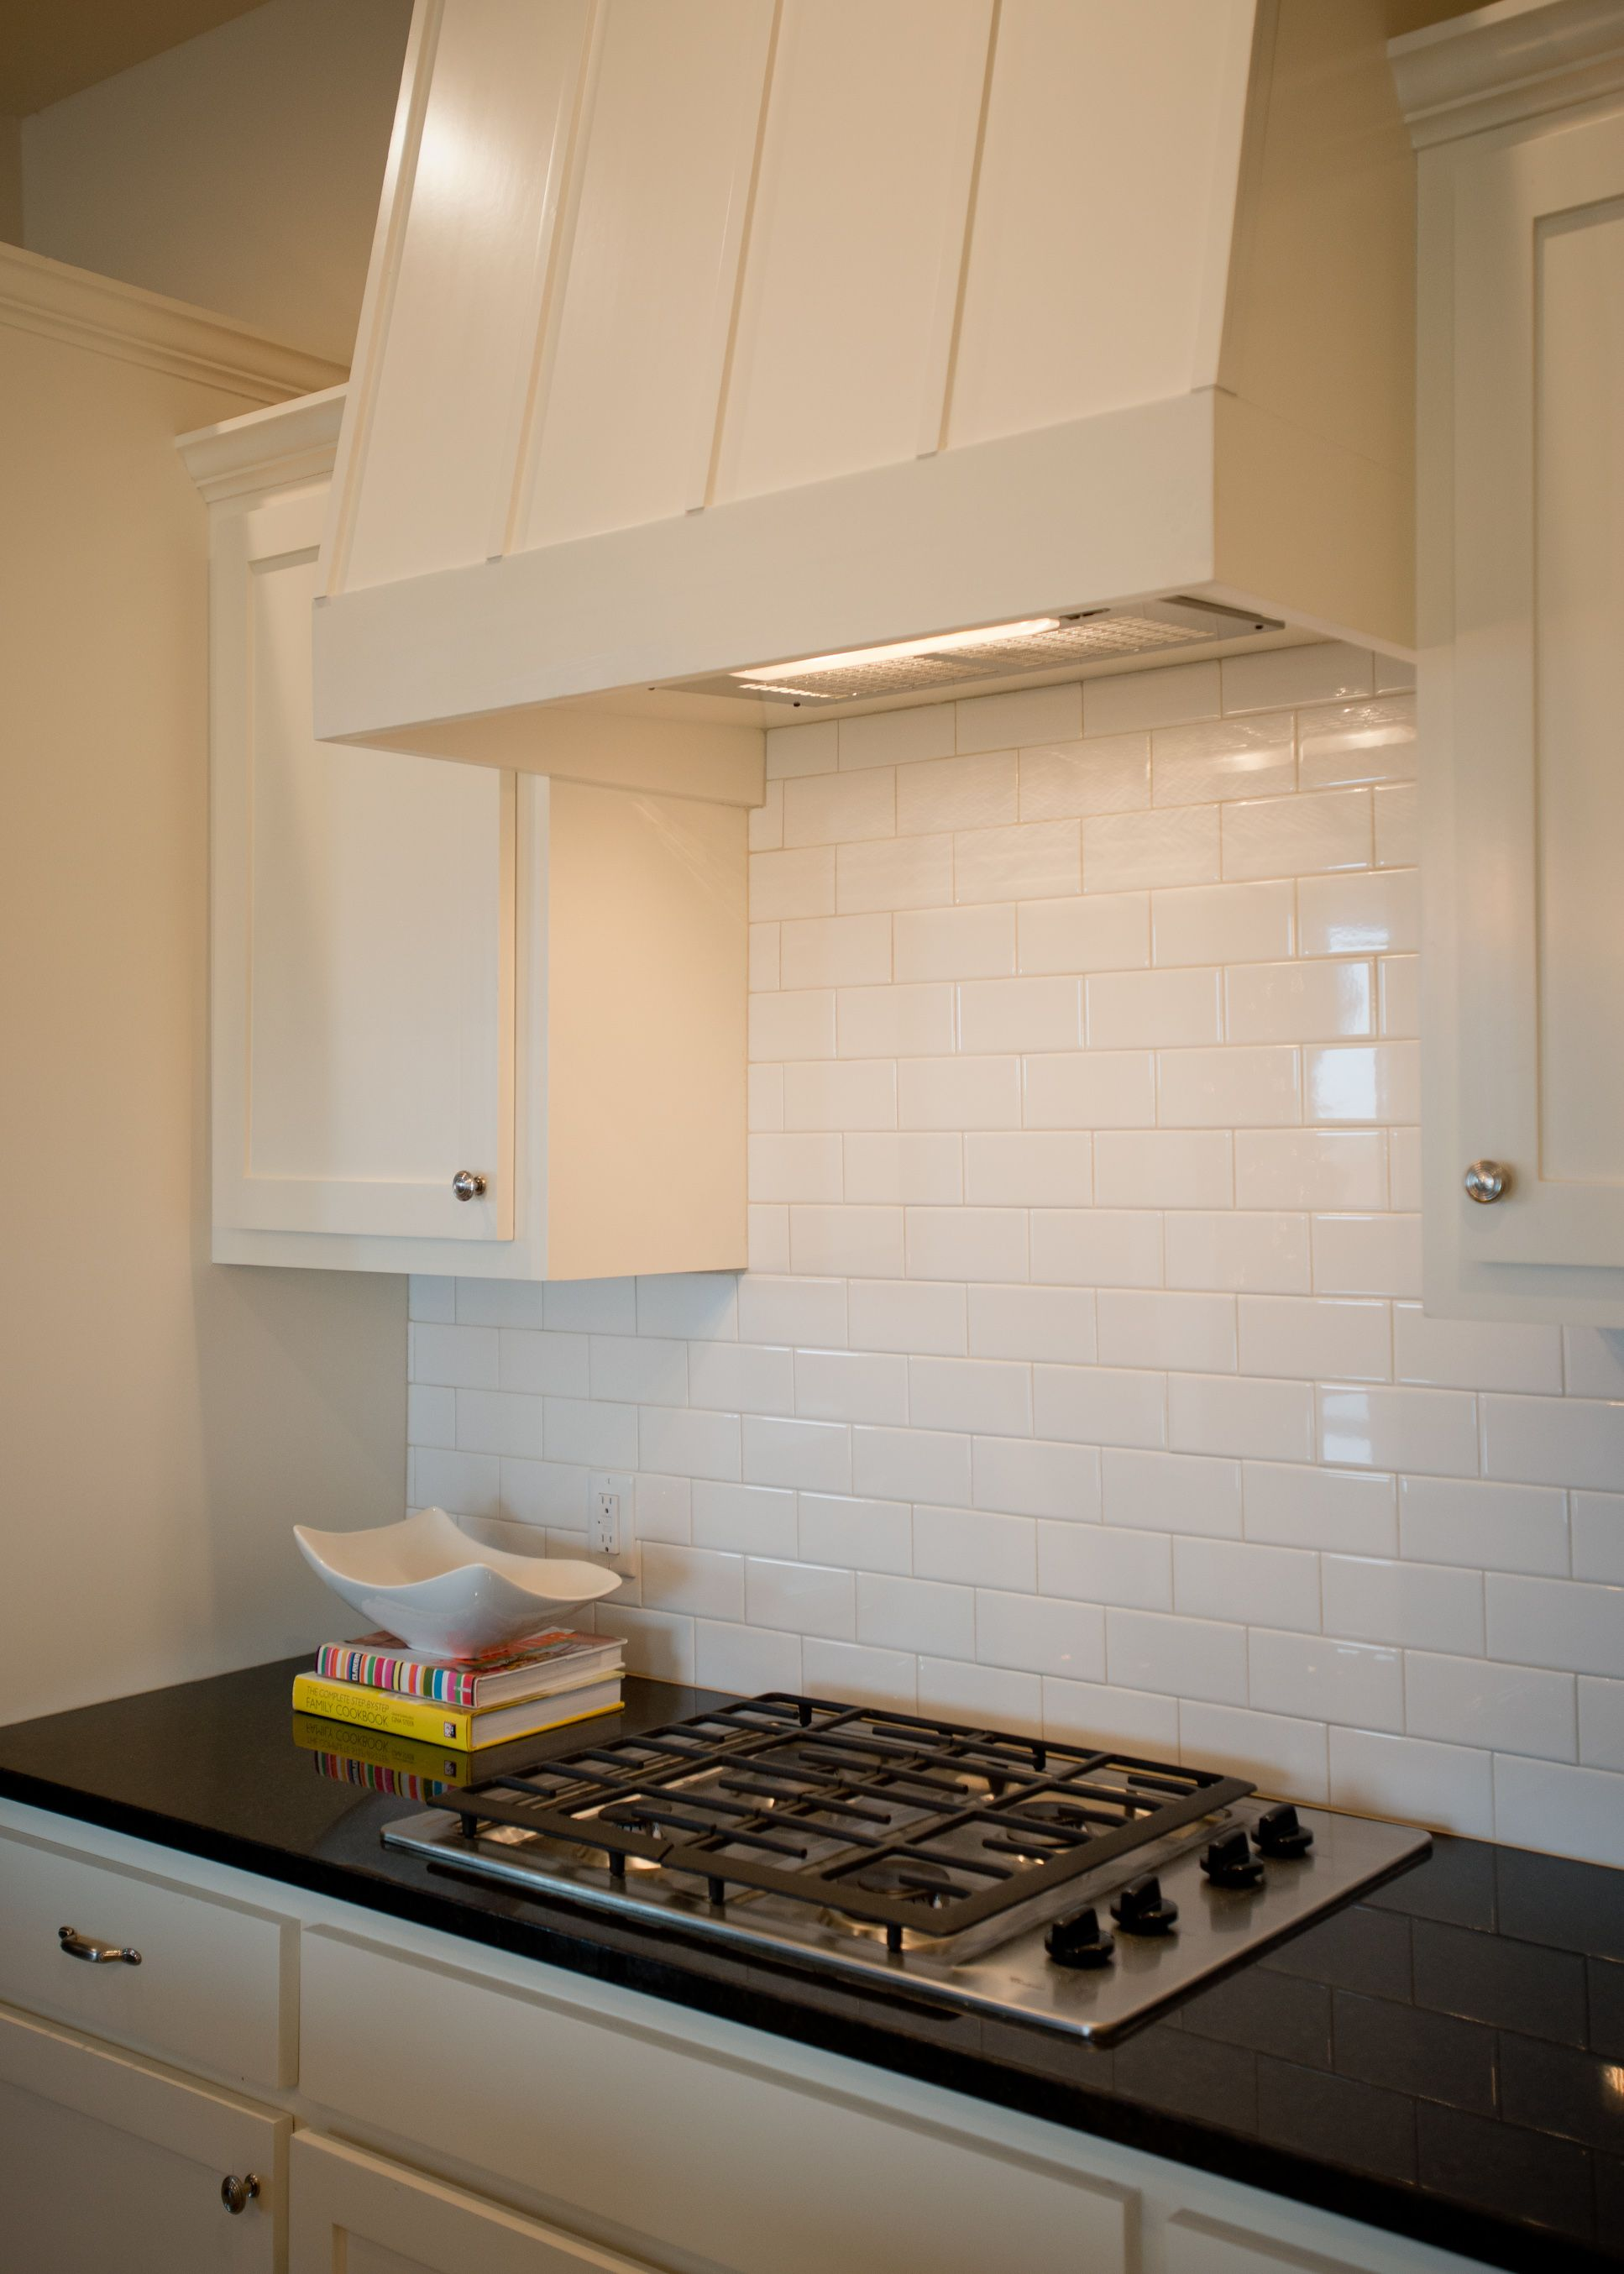 Craftsman Kitchen Backsplash Refurbished Table And Chairs Cardona Floor Plan Style Vent Hood Subway